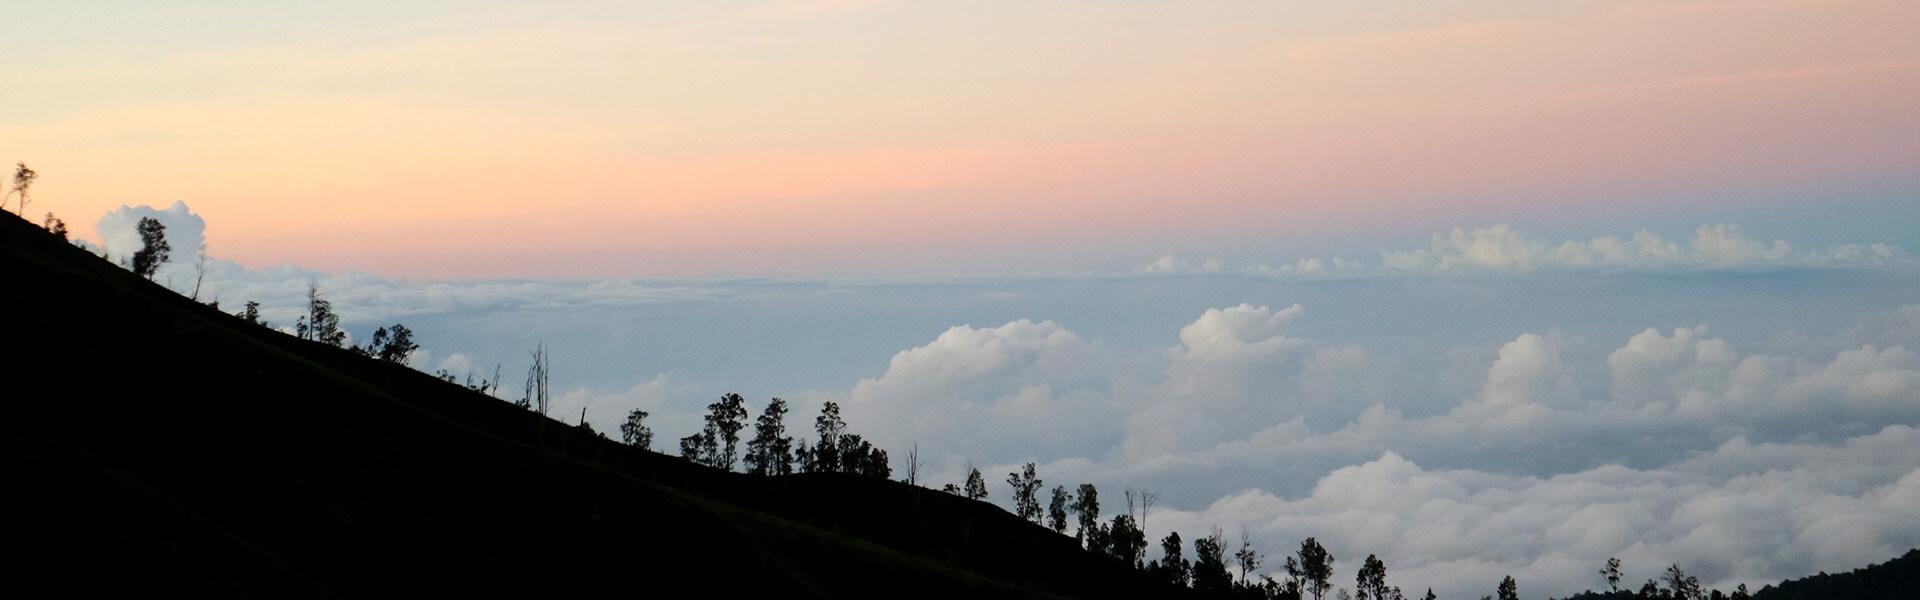 Destinasi Wisata Banyuwangi